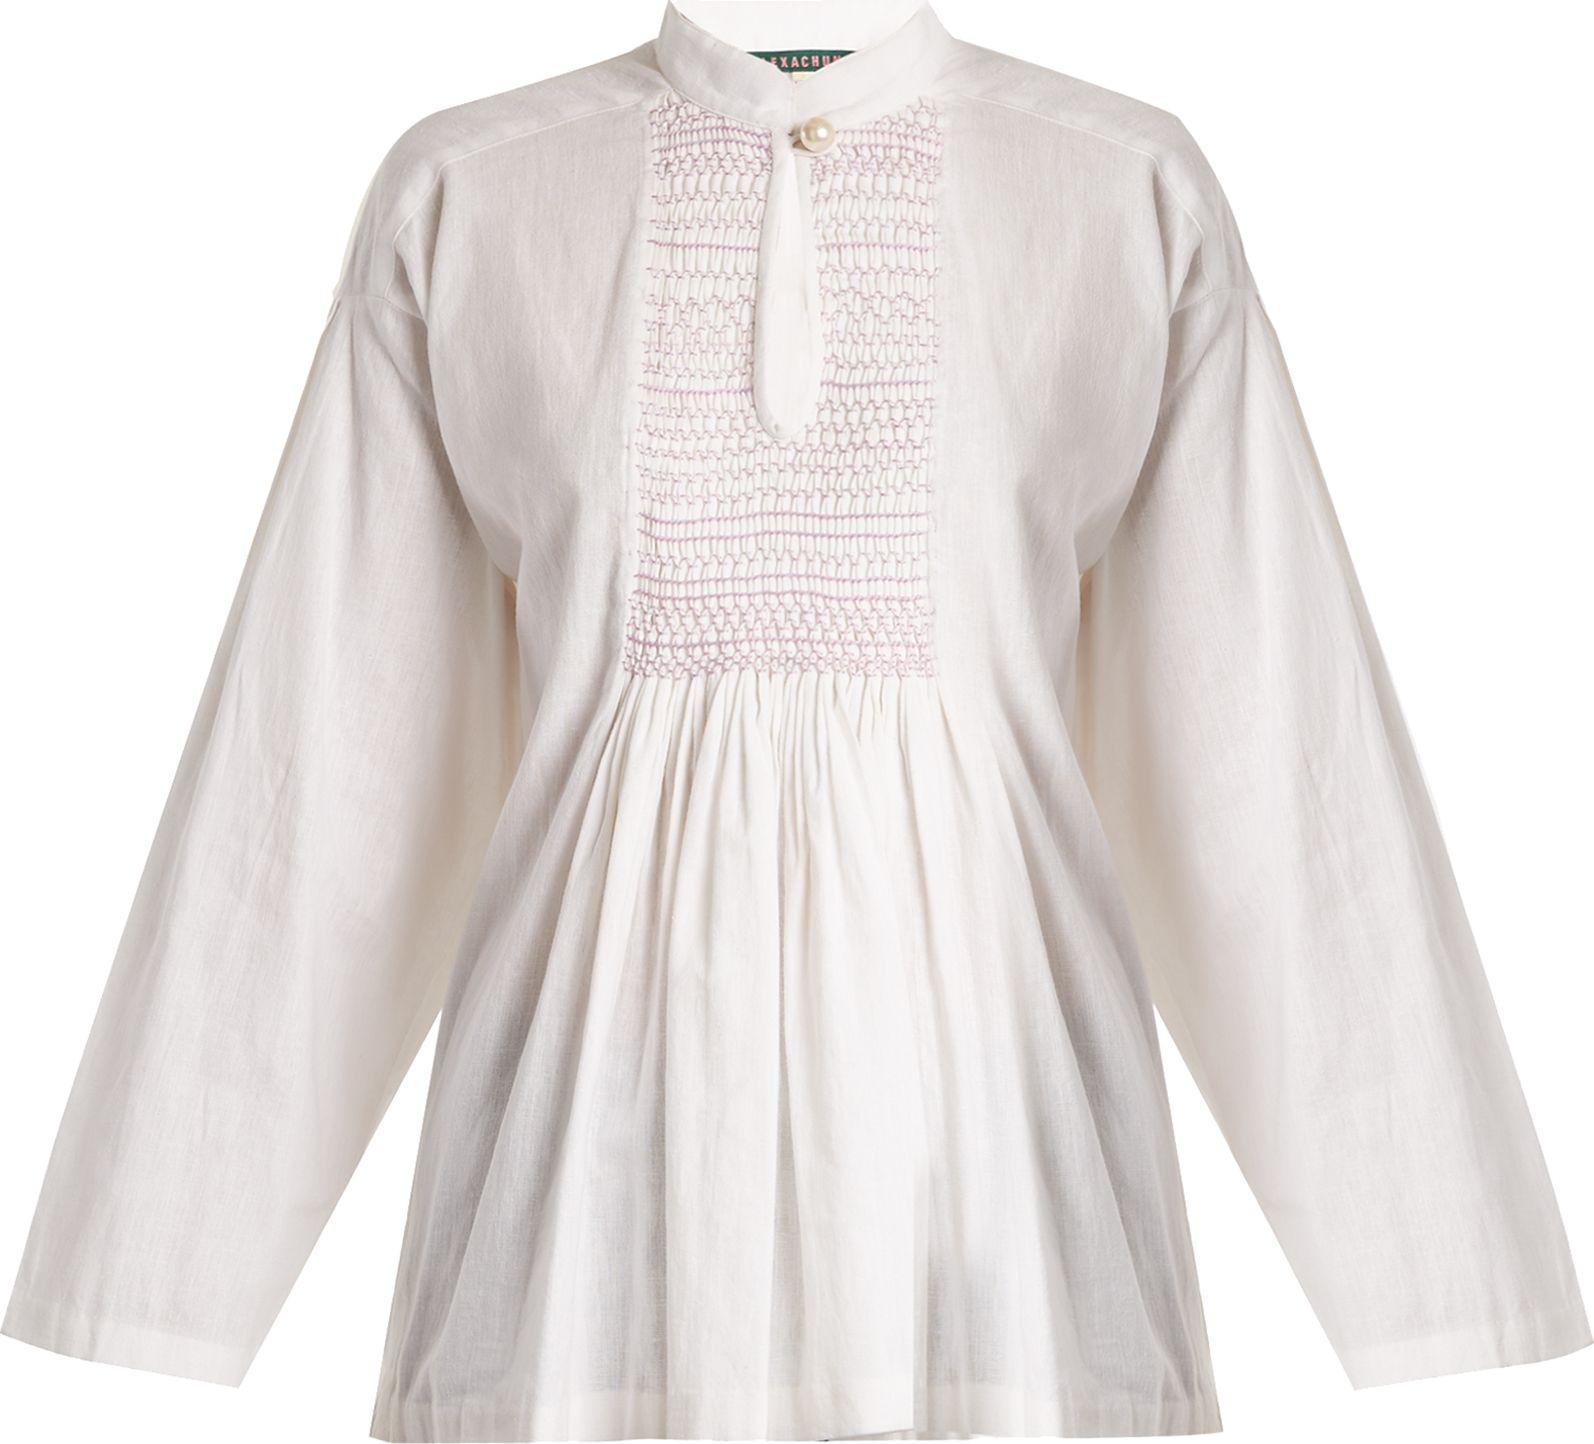 Alexachung - Mandarin-collar smocked linen top